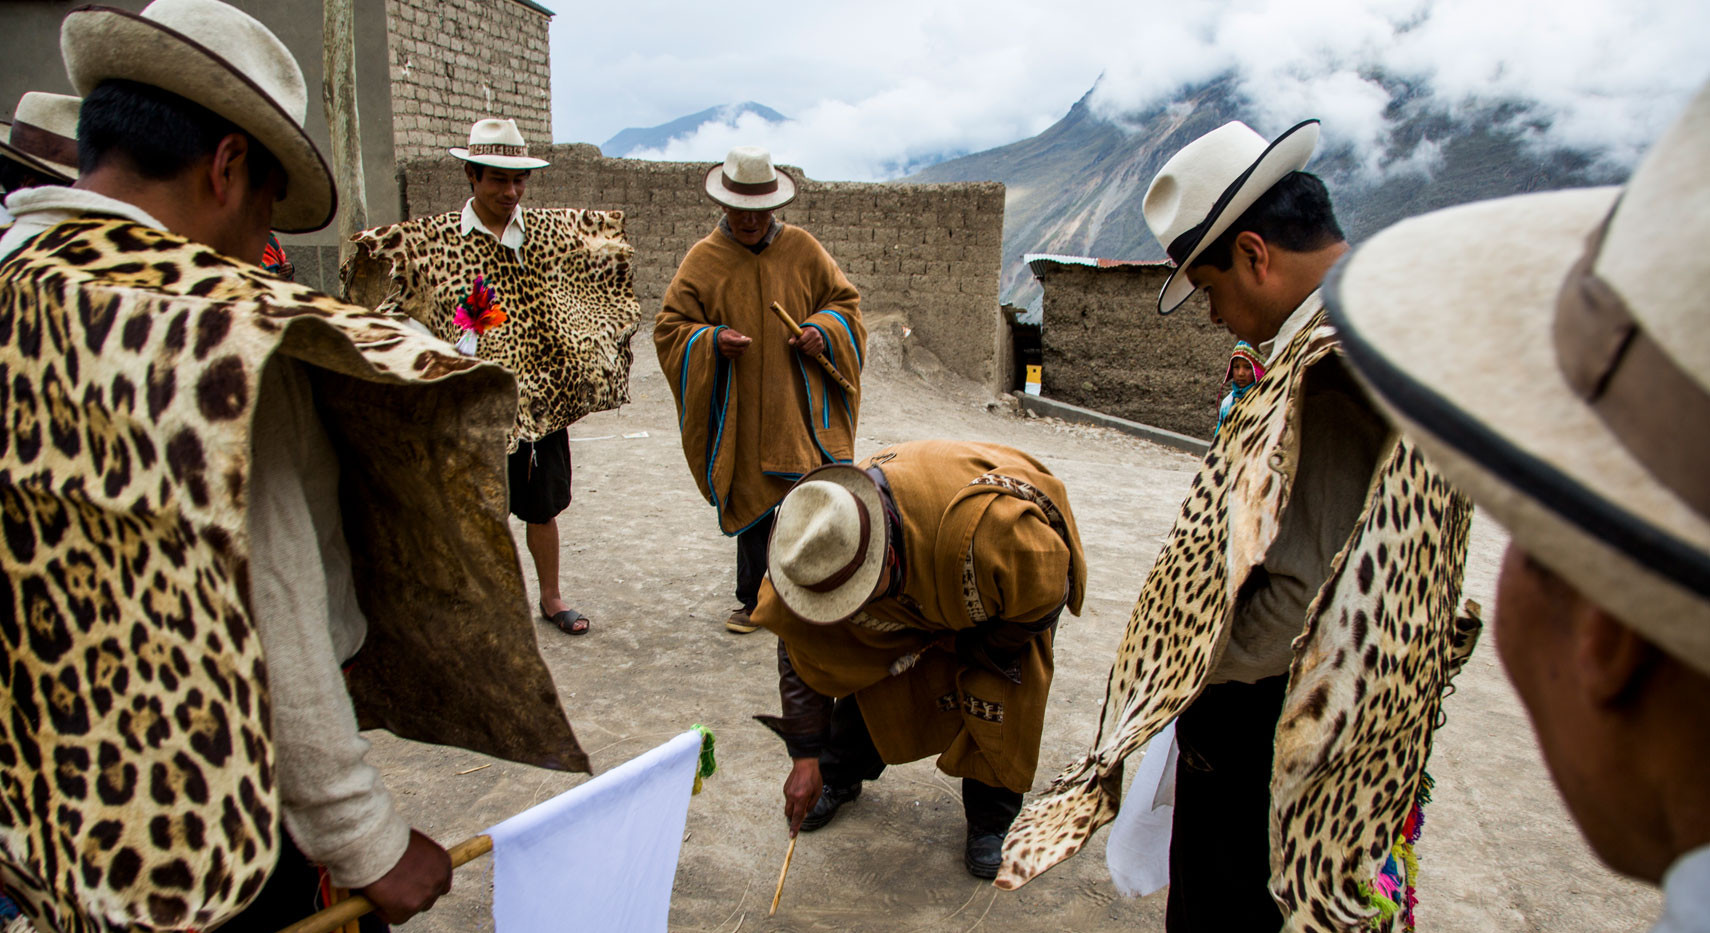 181114_MHP_Bolivia_2912.jpg